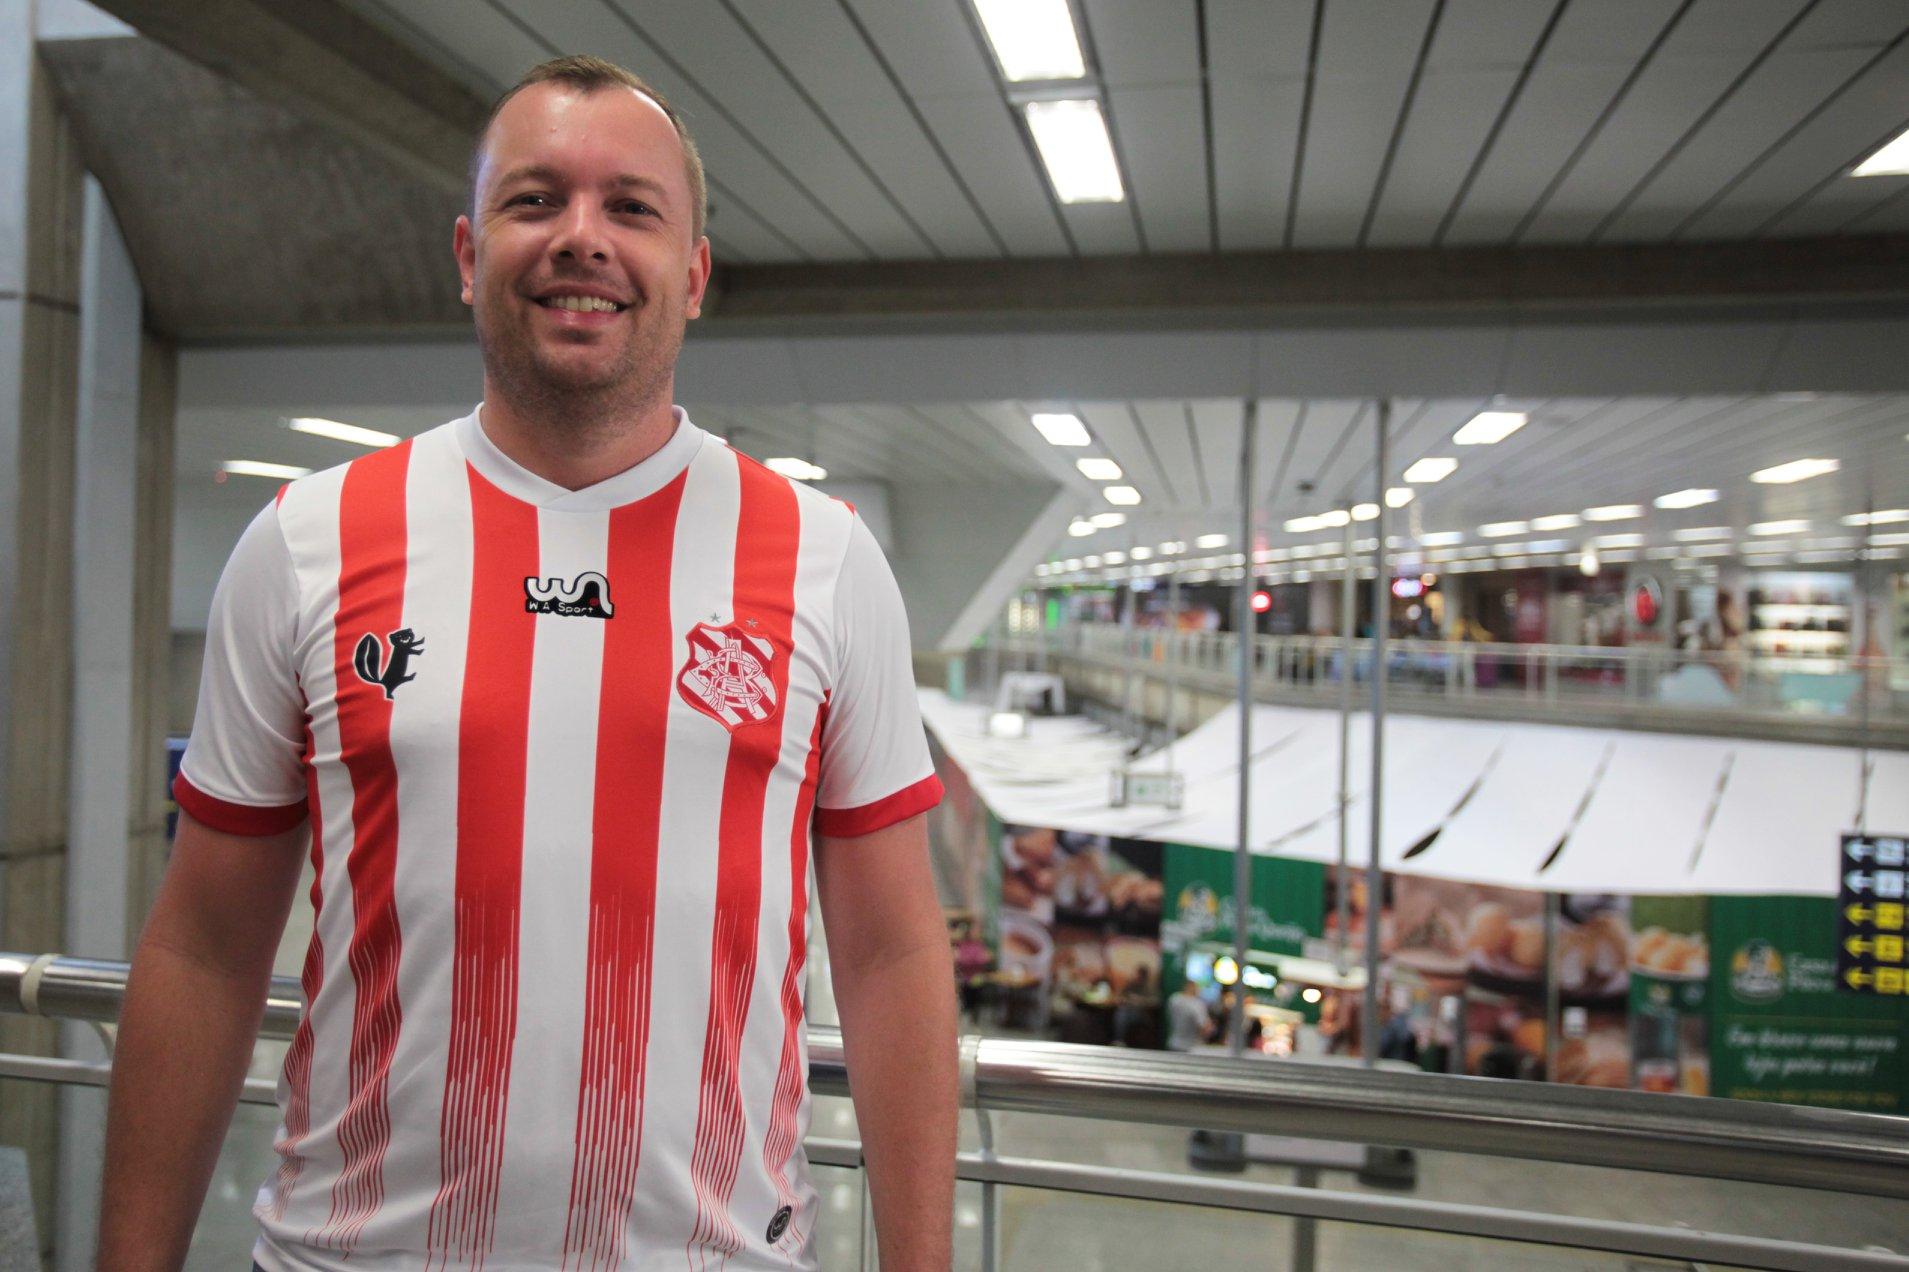 Ederson - Bangu Atlético Clube